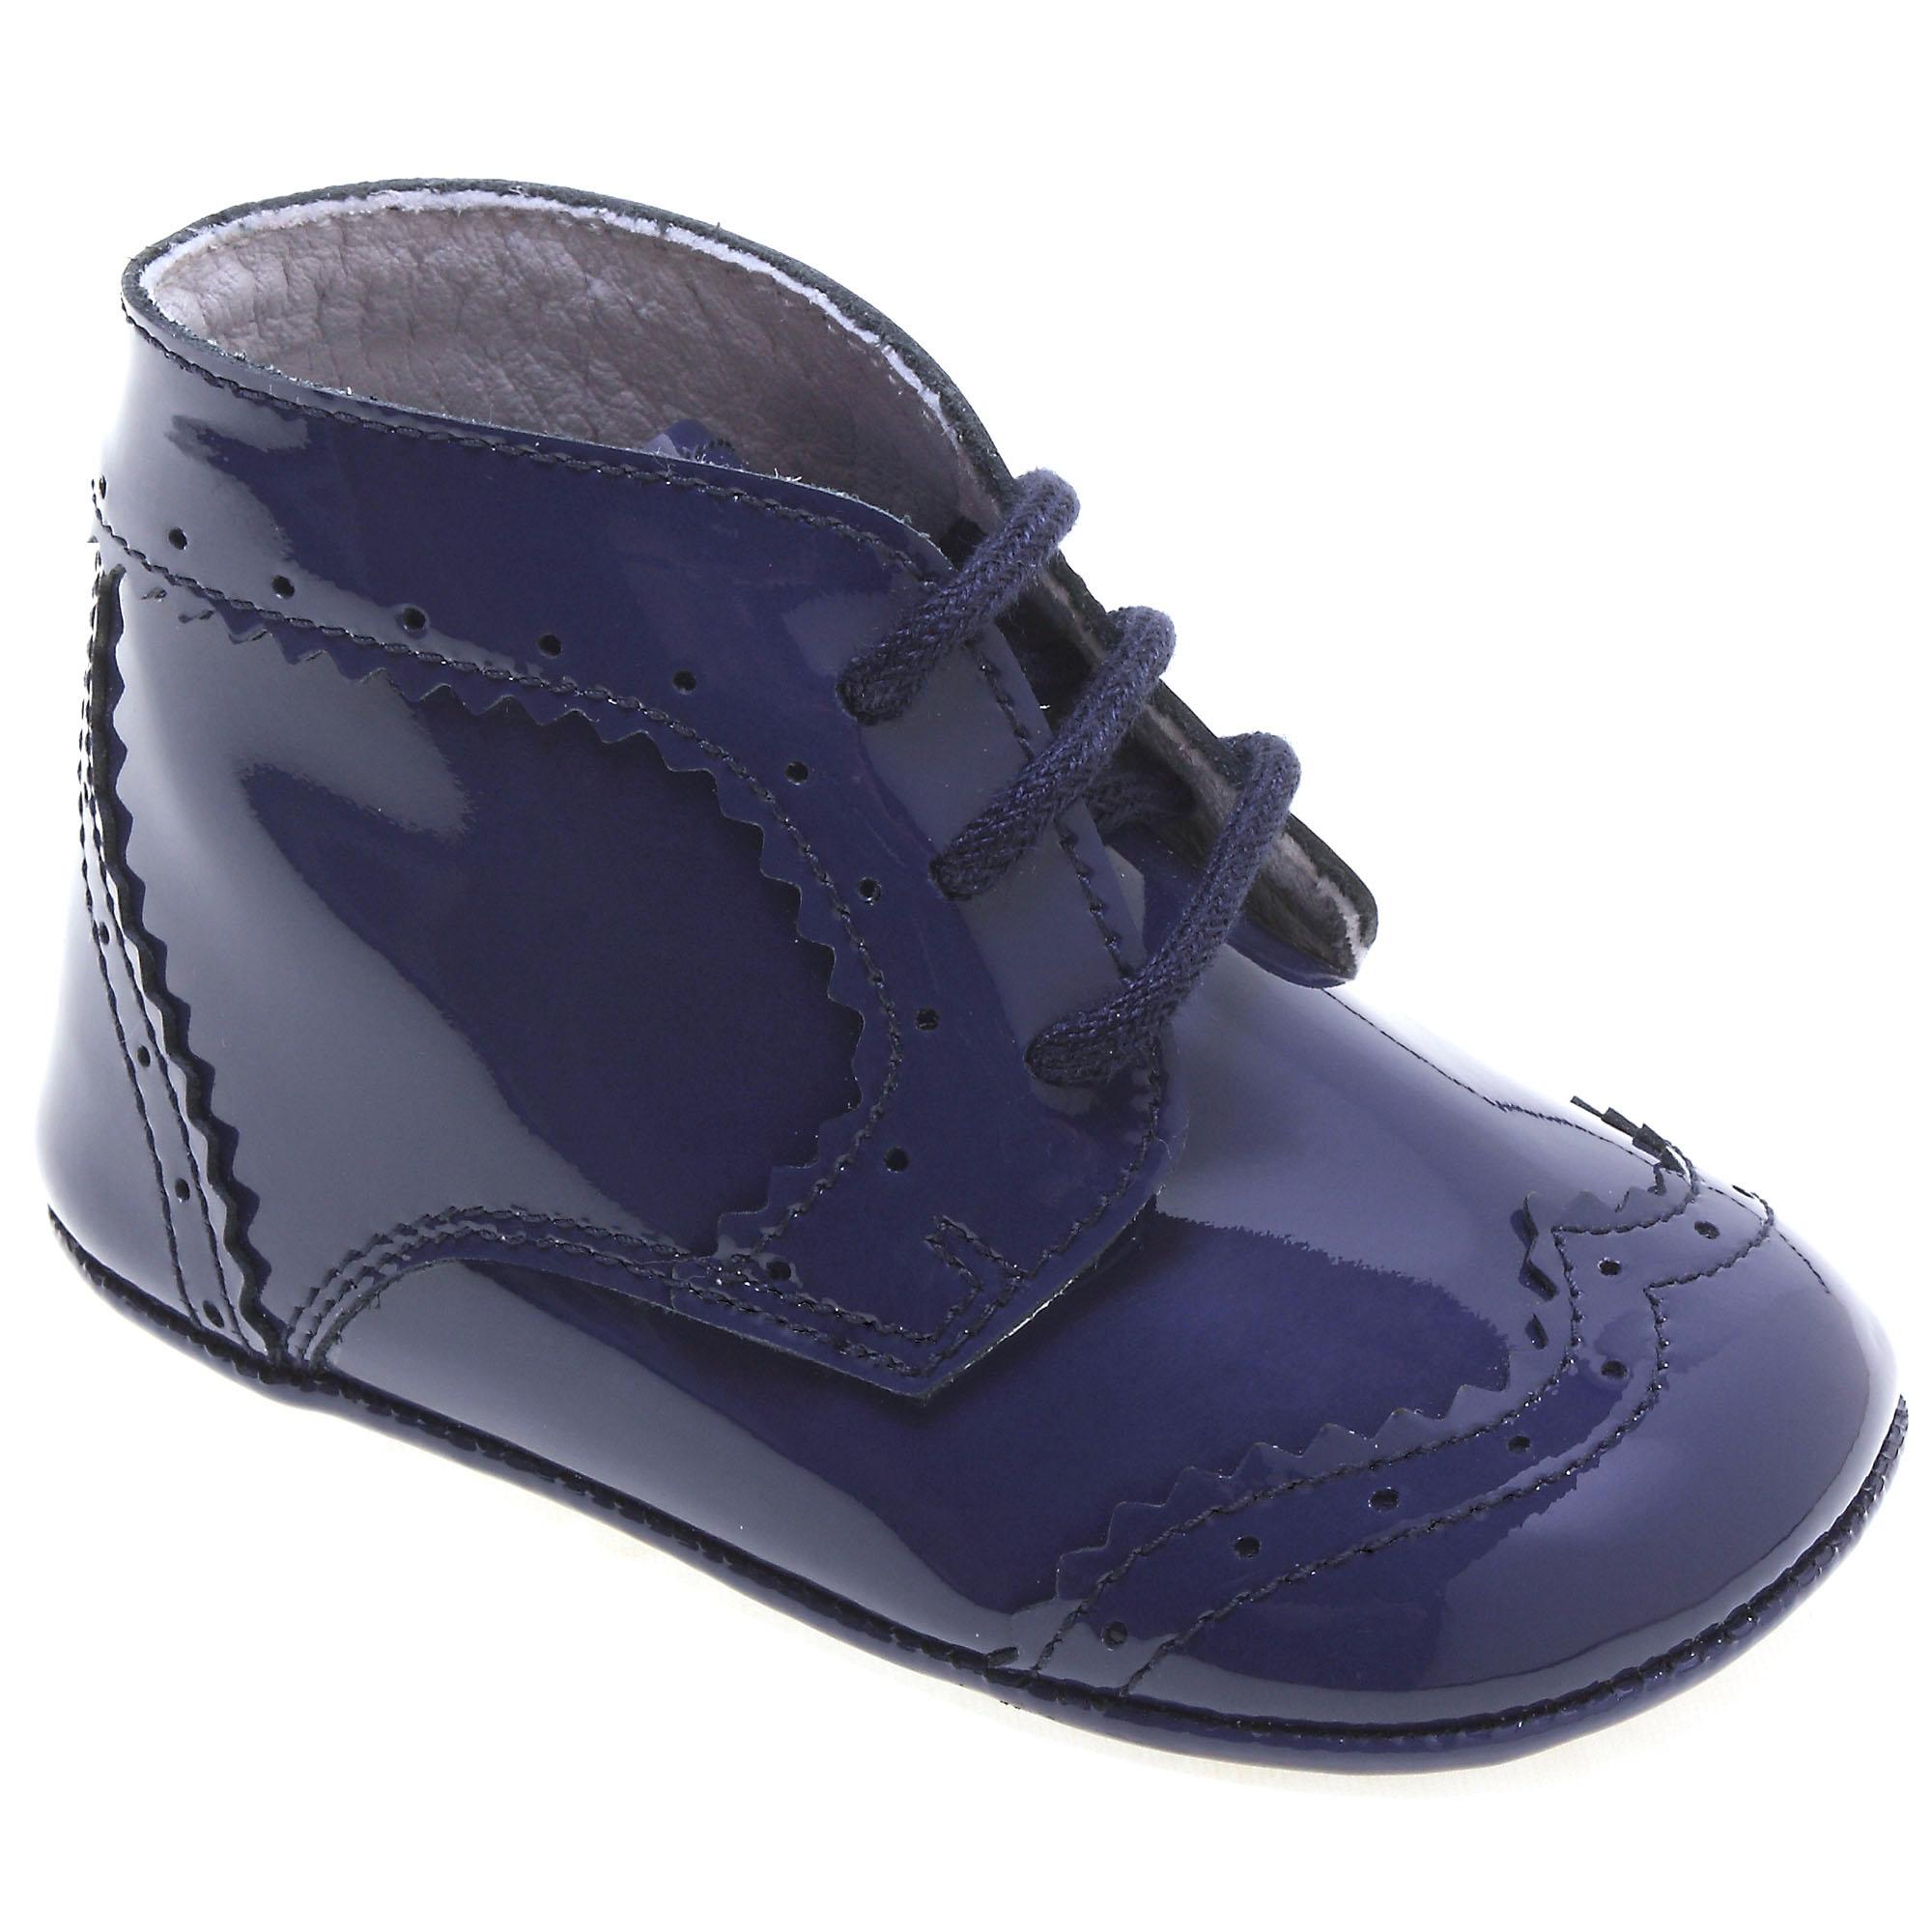 Baby Boys Light Navy Patent Pram Shoes